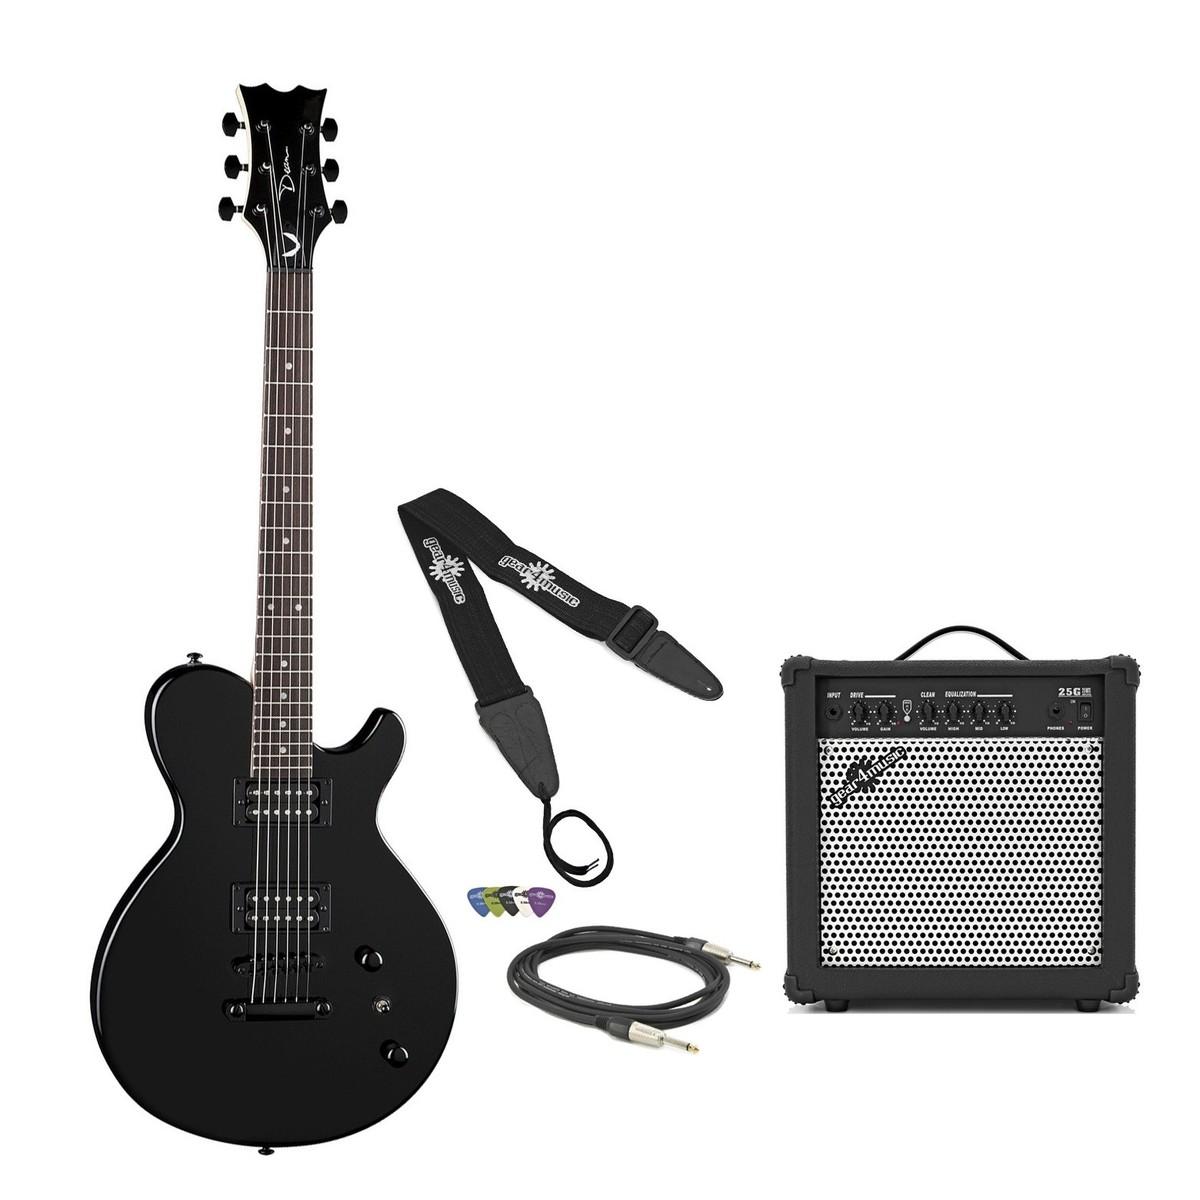 dean evo xm guitar pack classic black at gear4music. Black Bedroom Furniture Sets. Home Design Ideas